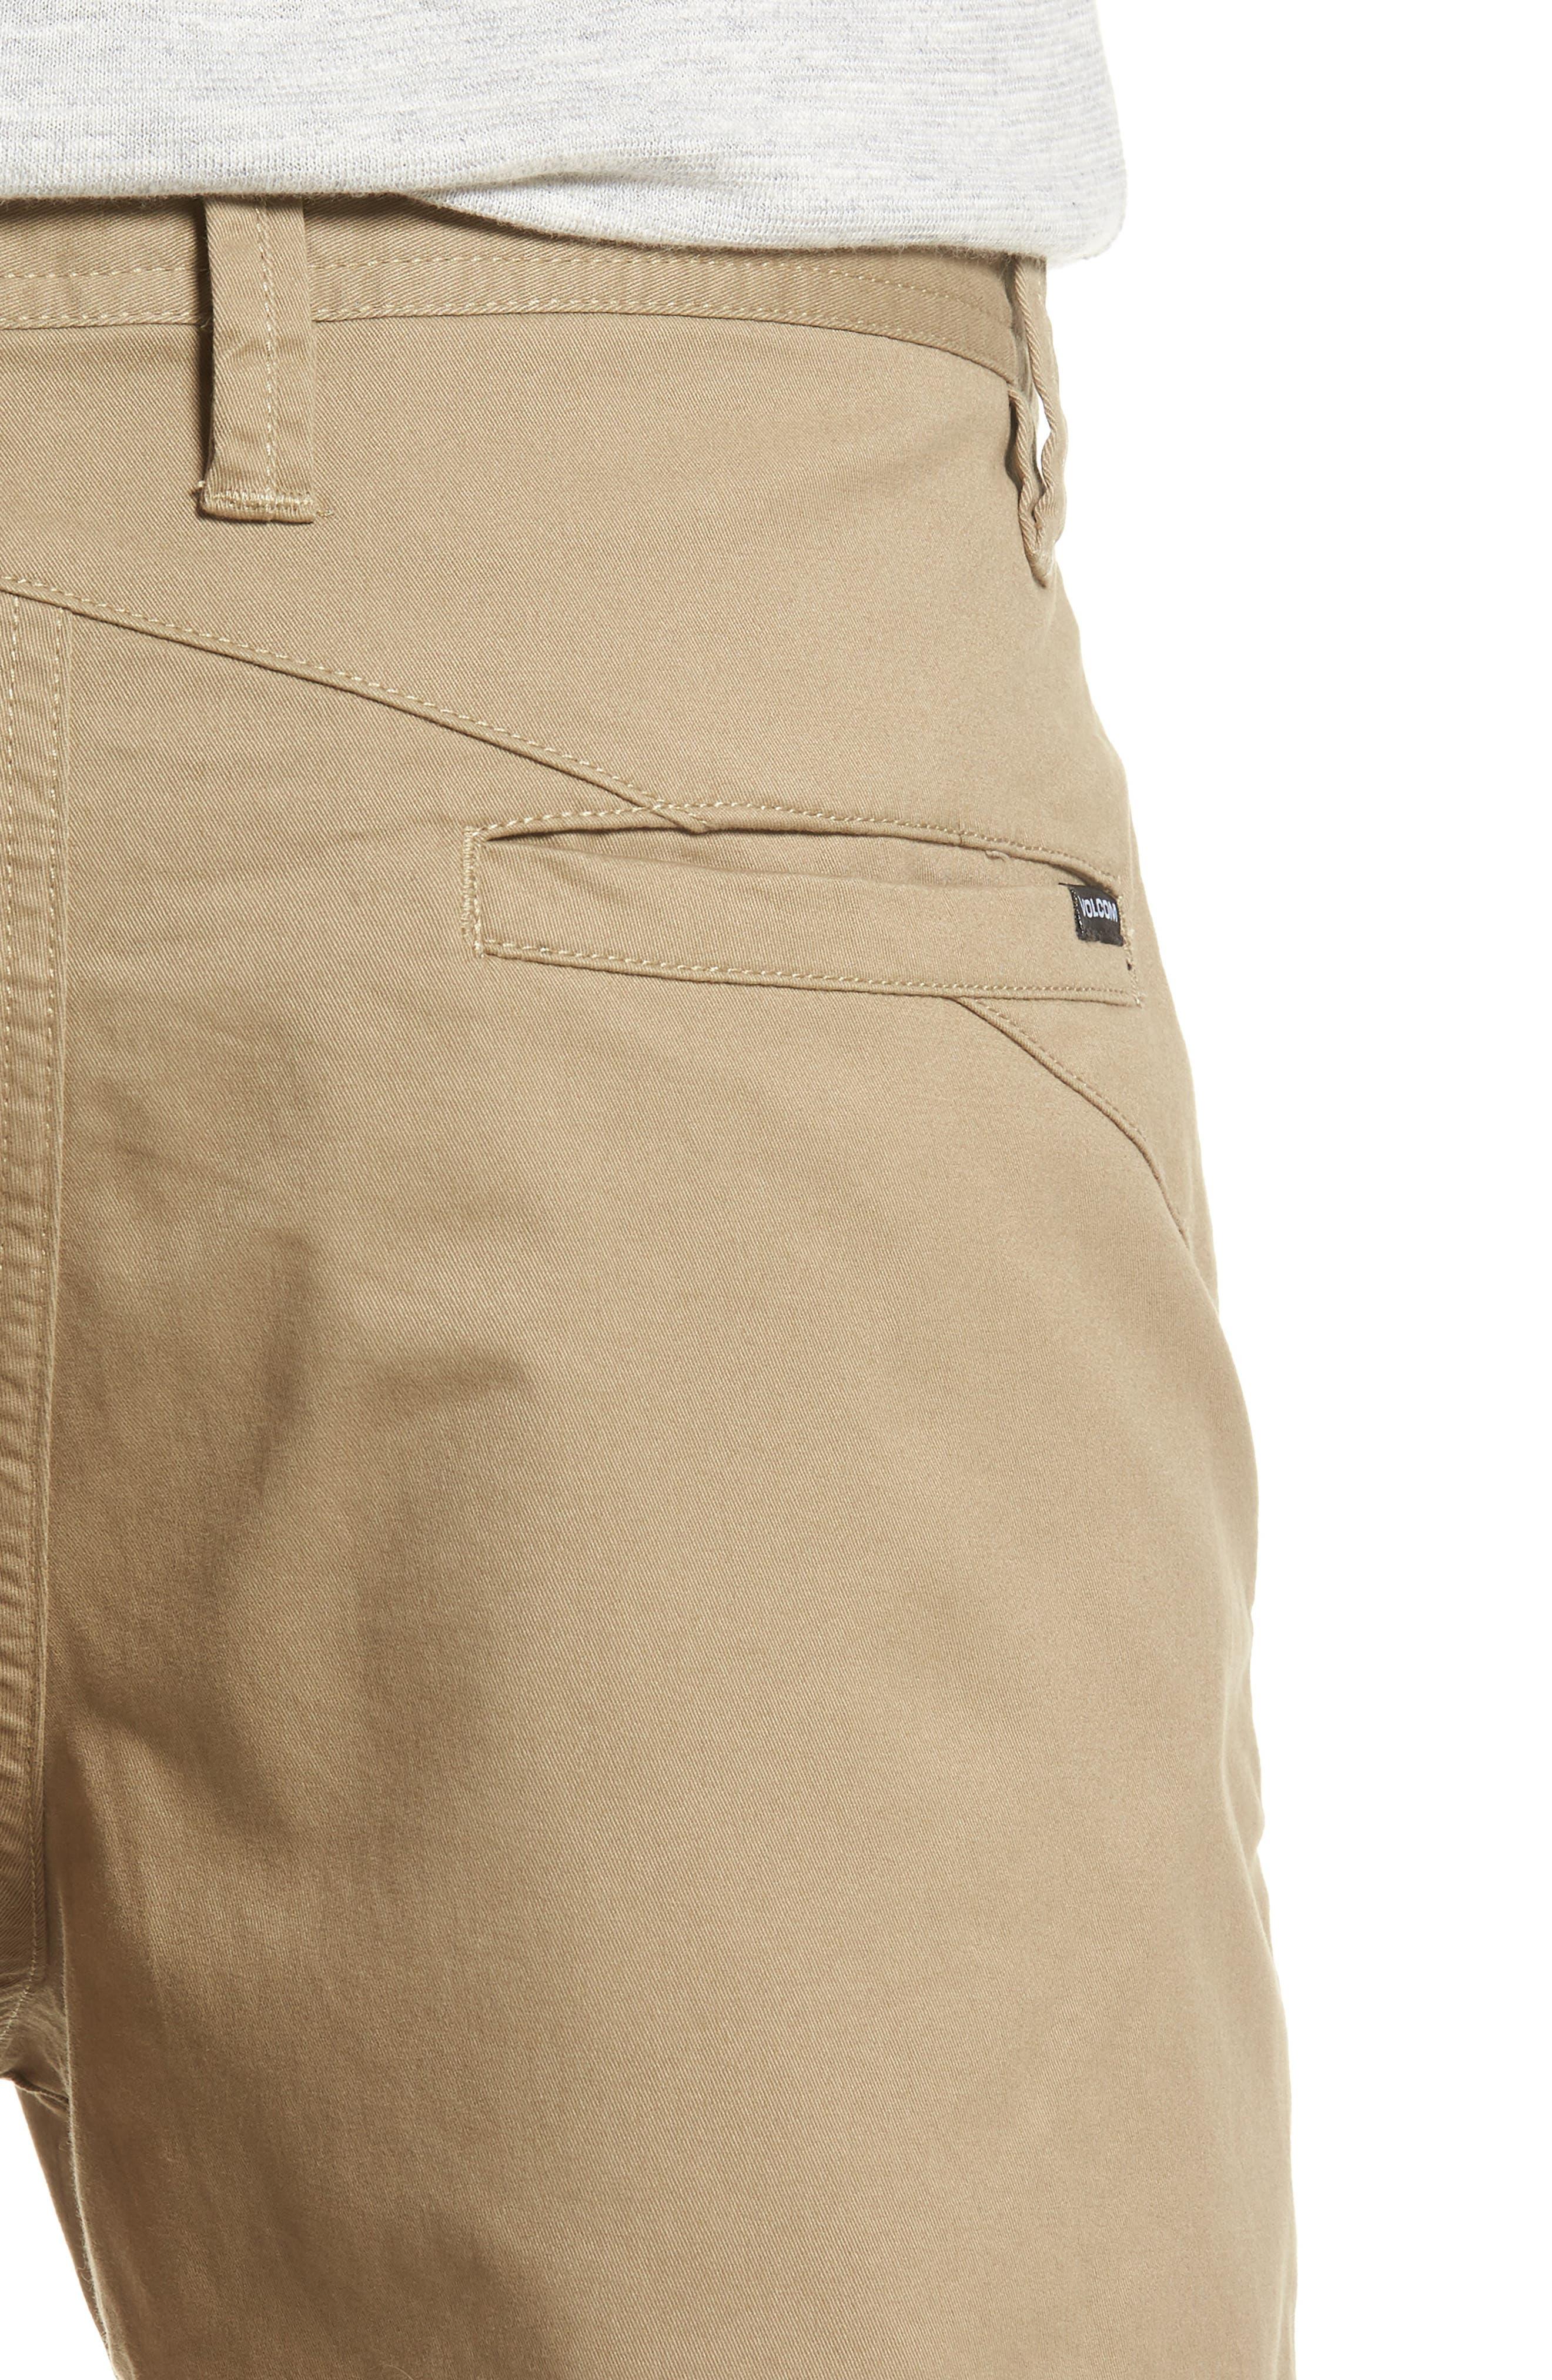 Lightweight Shorts,                             Alternate thumbnail 4, color,                             KHAKI